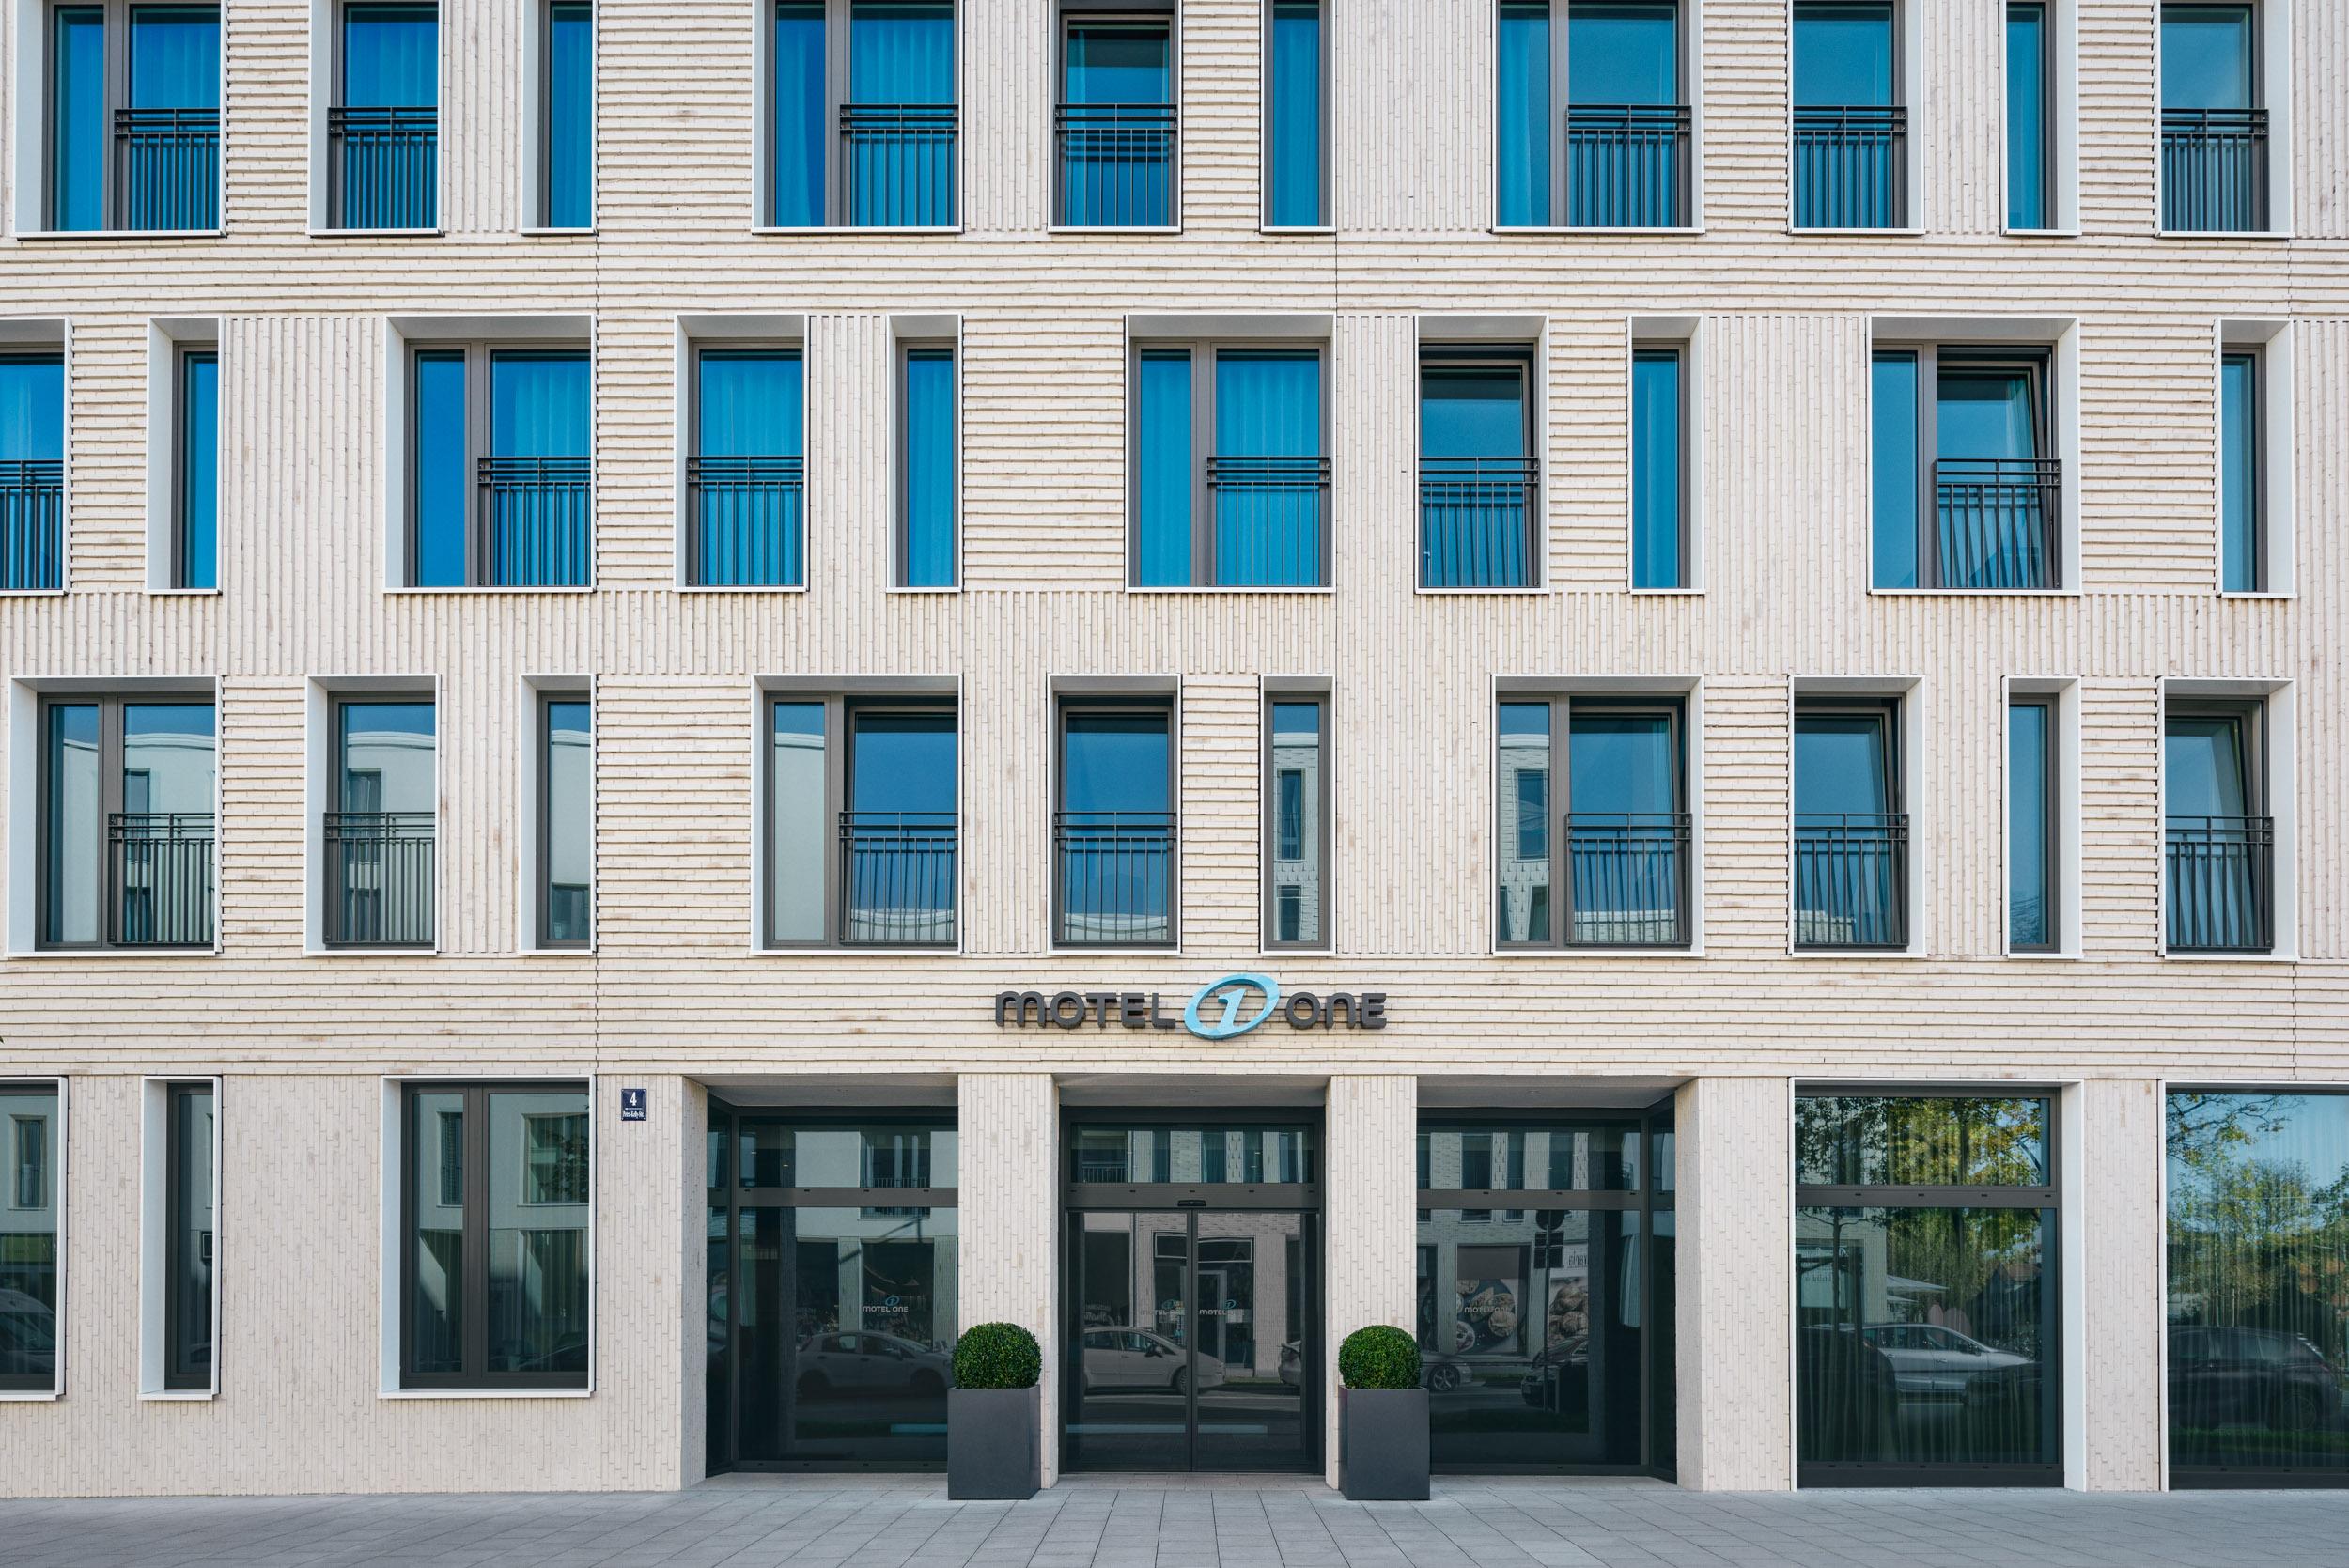 Gustav-Epple-Bauunternehmung-Motel-One-München-Olympiagate-MLX8572